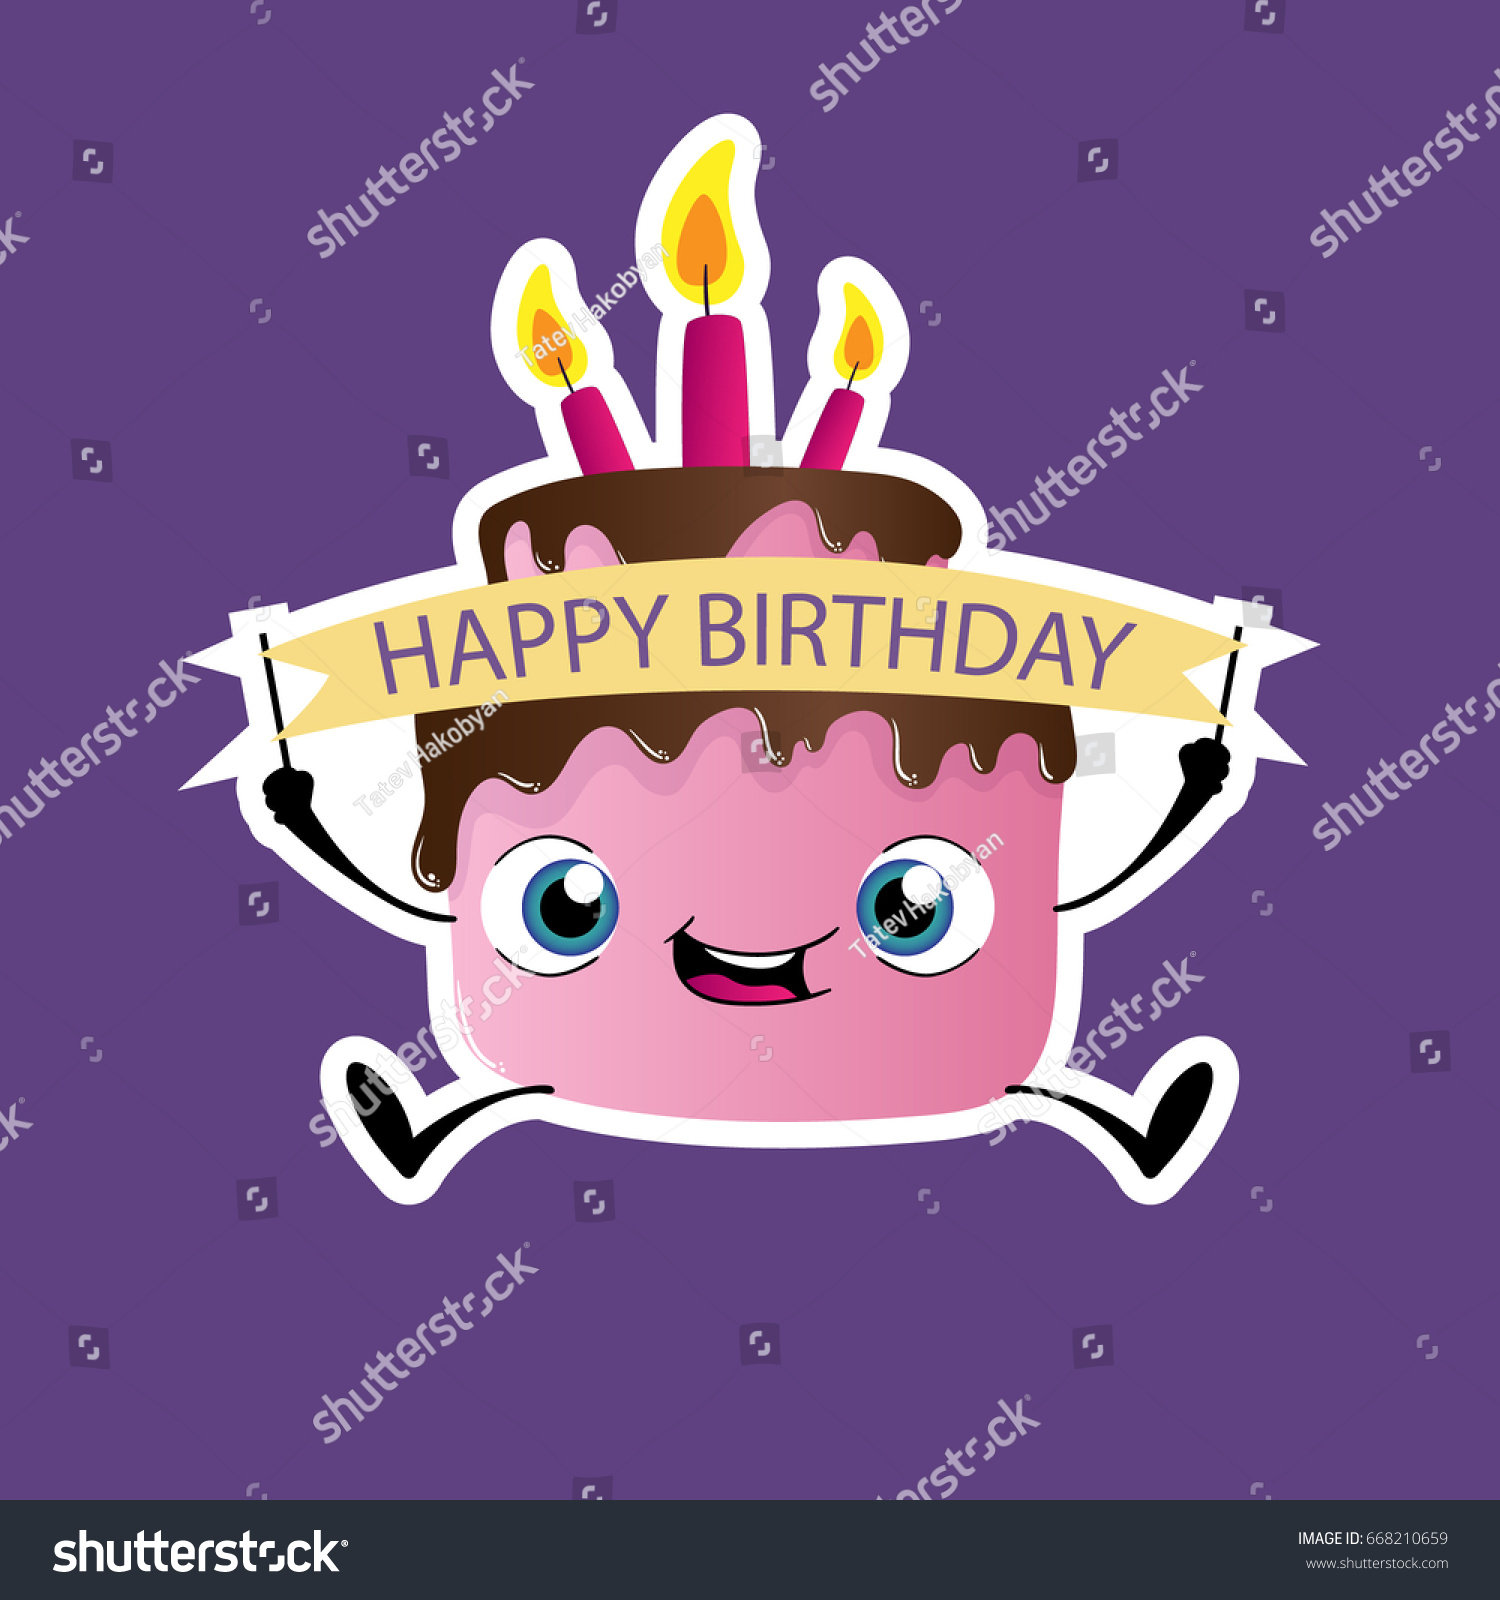 Fabulous Happy Birthday Cake Clipart Stock Vector Royalty Free 668210659 Funny Birthday Cards Online Elaedamsfinfo